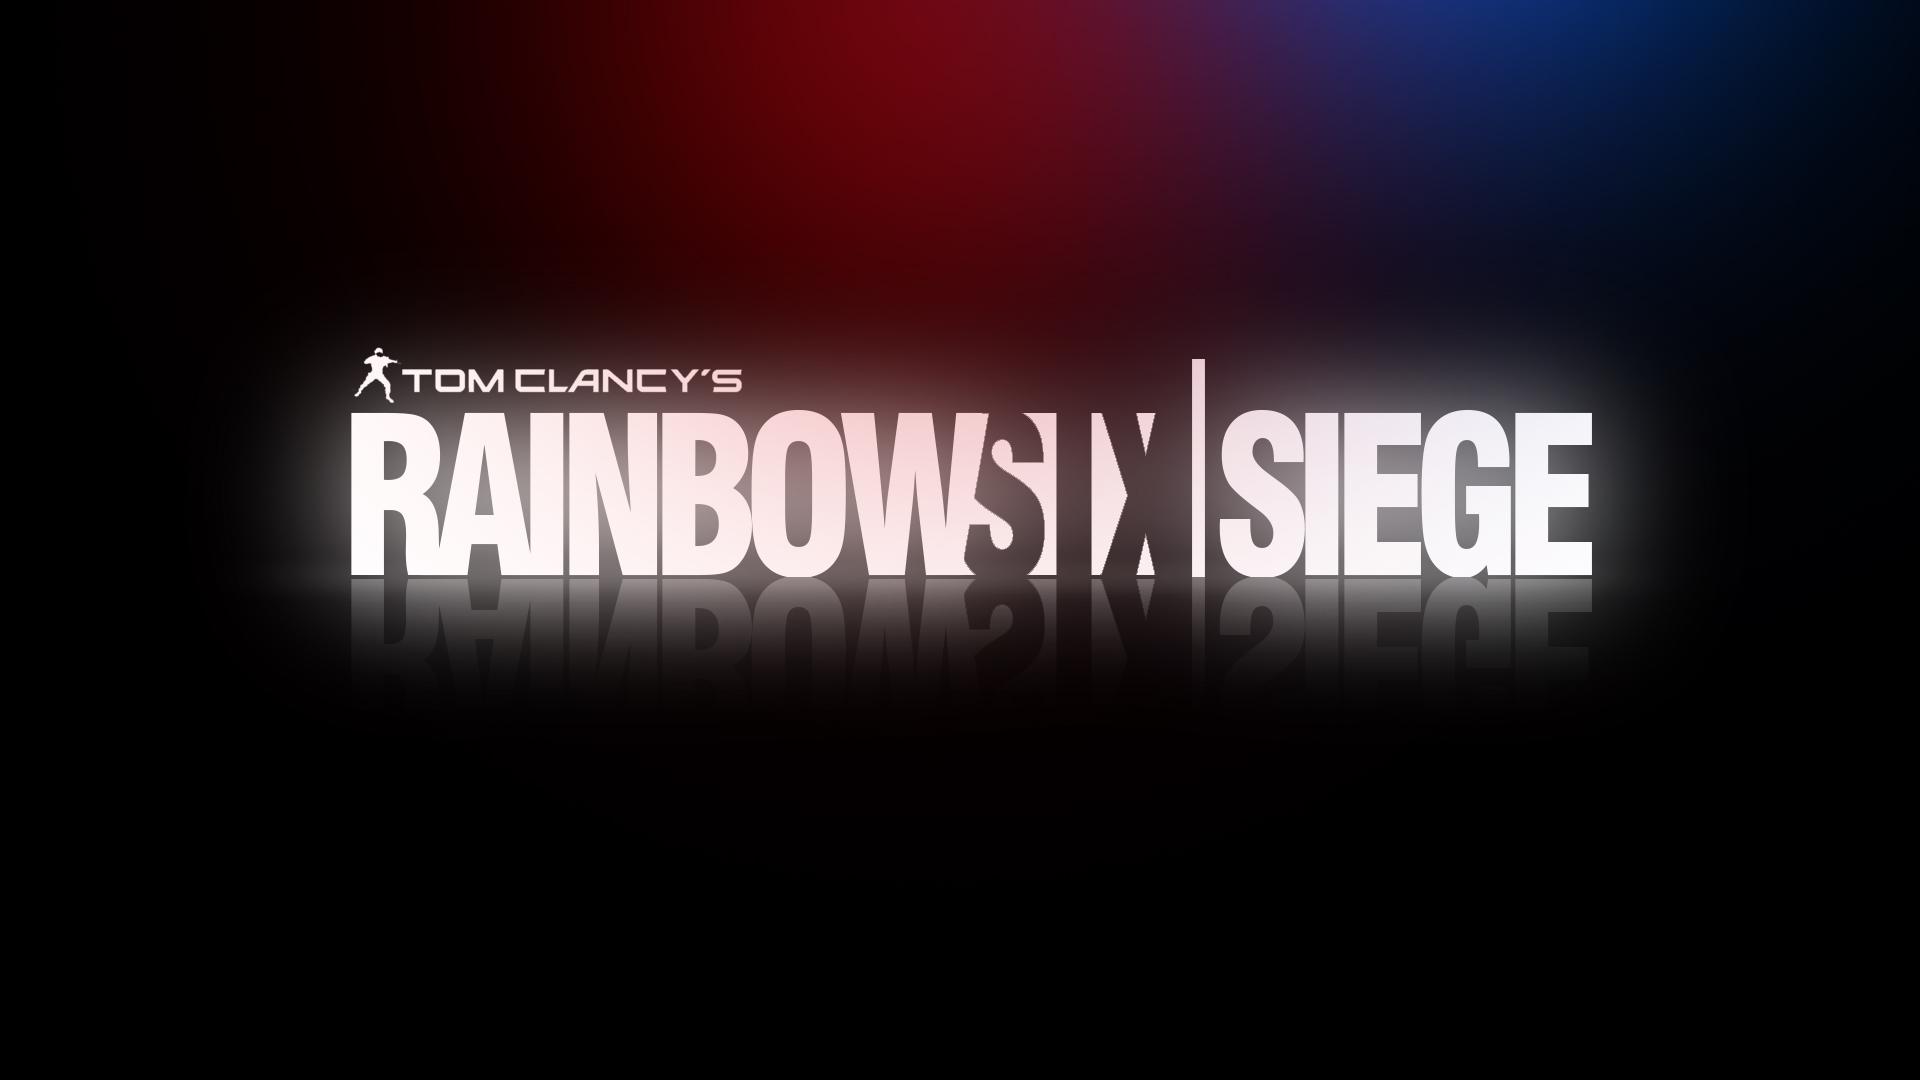 Tom Clancy S Rainbow Six Siege Desktop Wallpaper 1920x1080